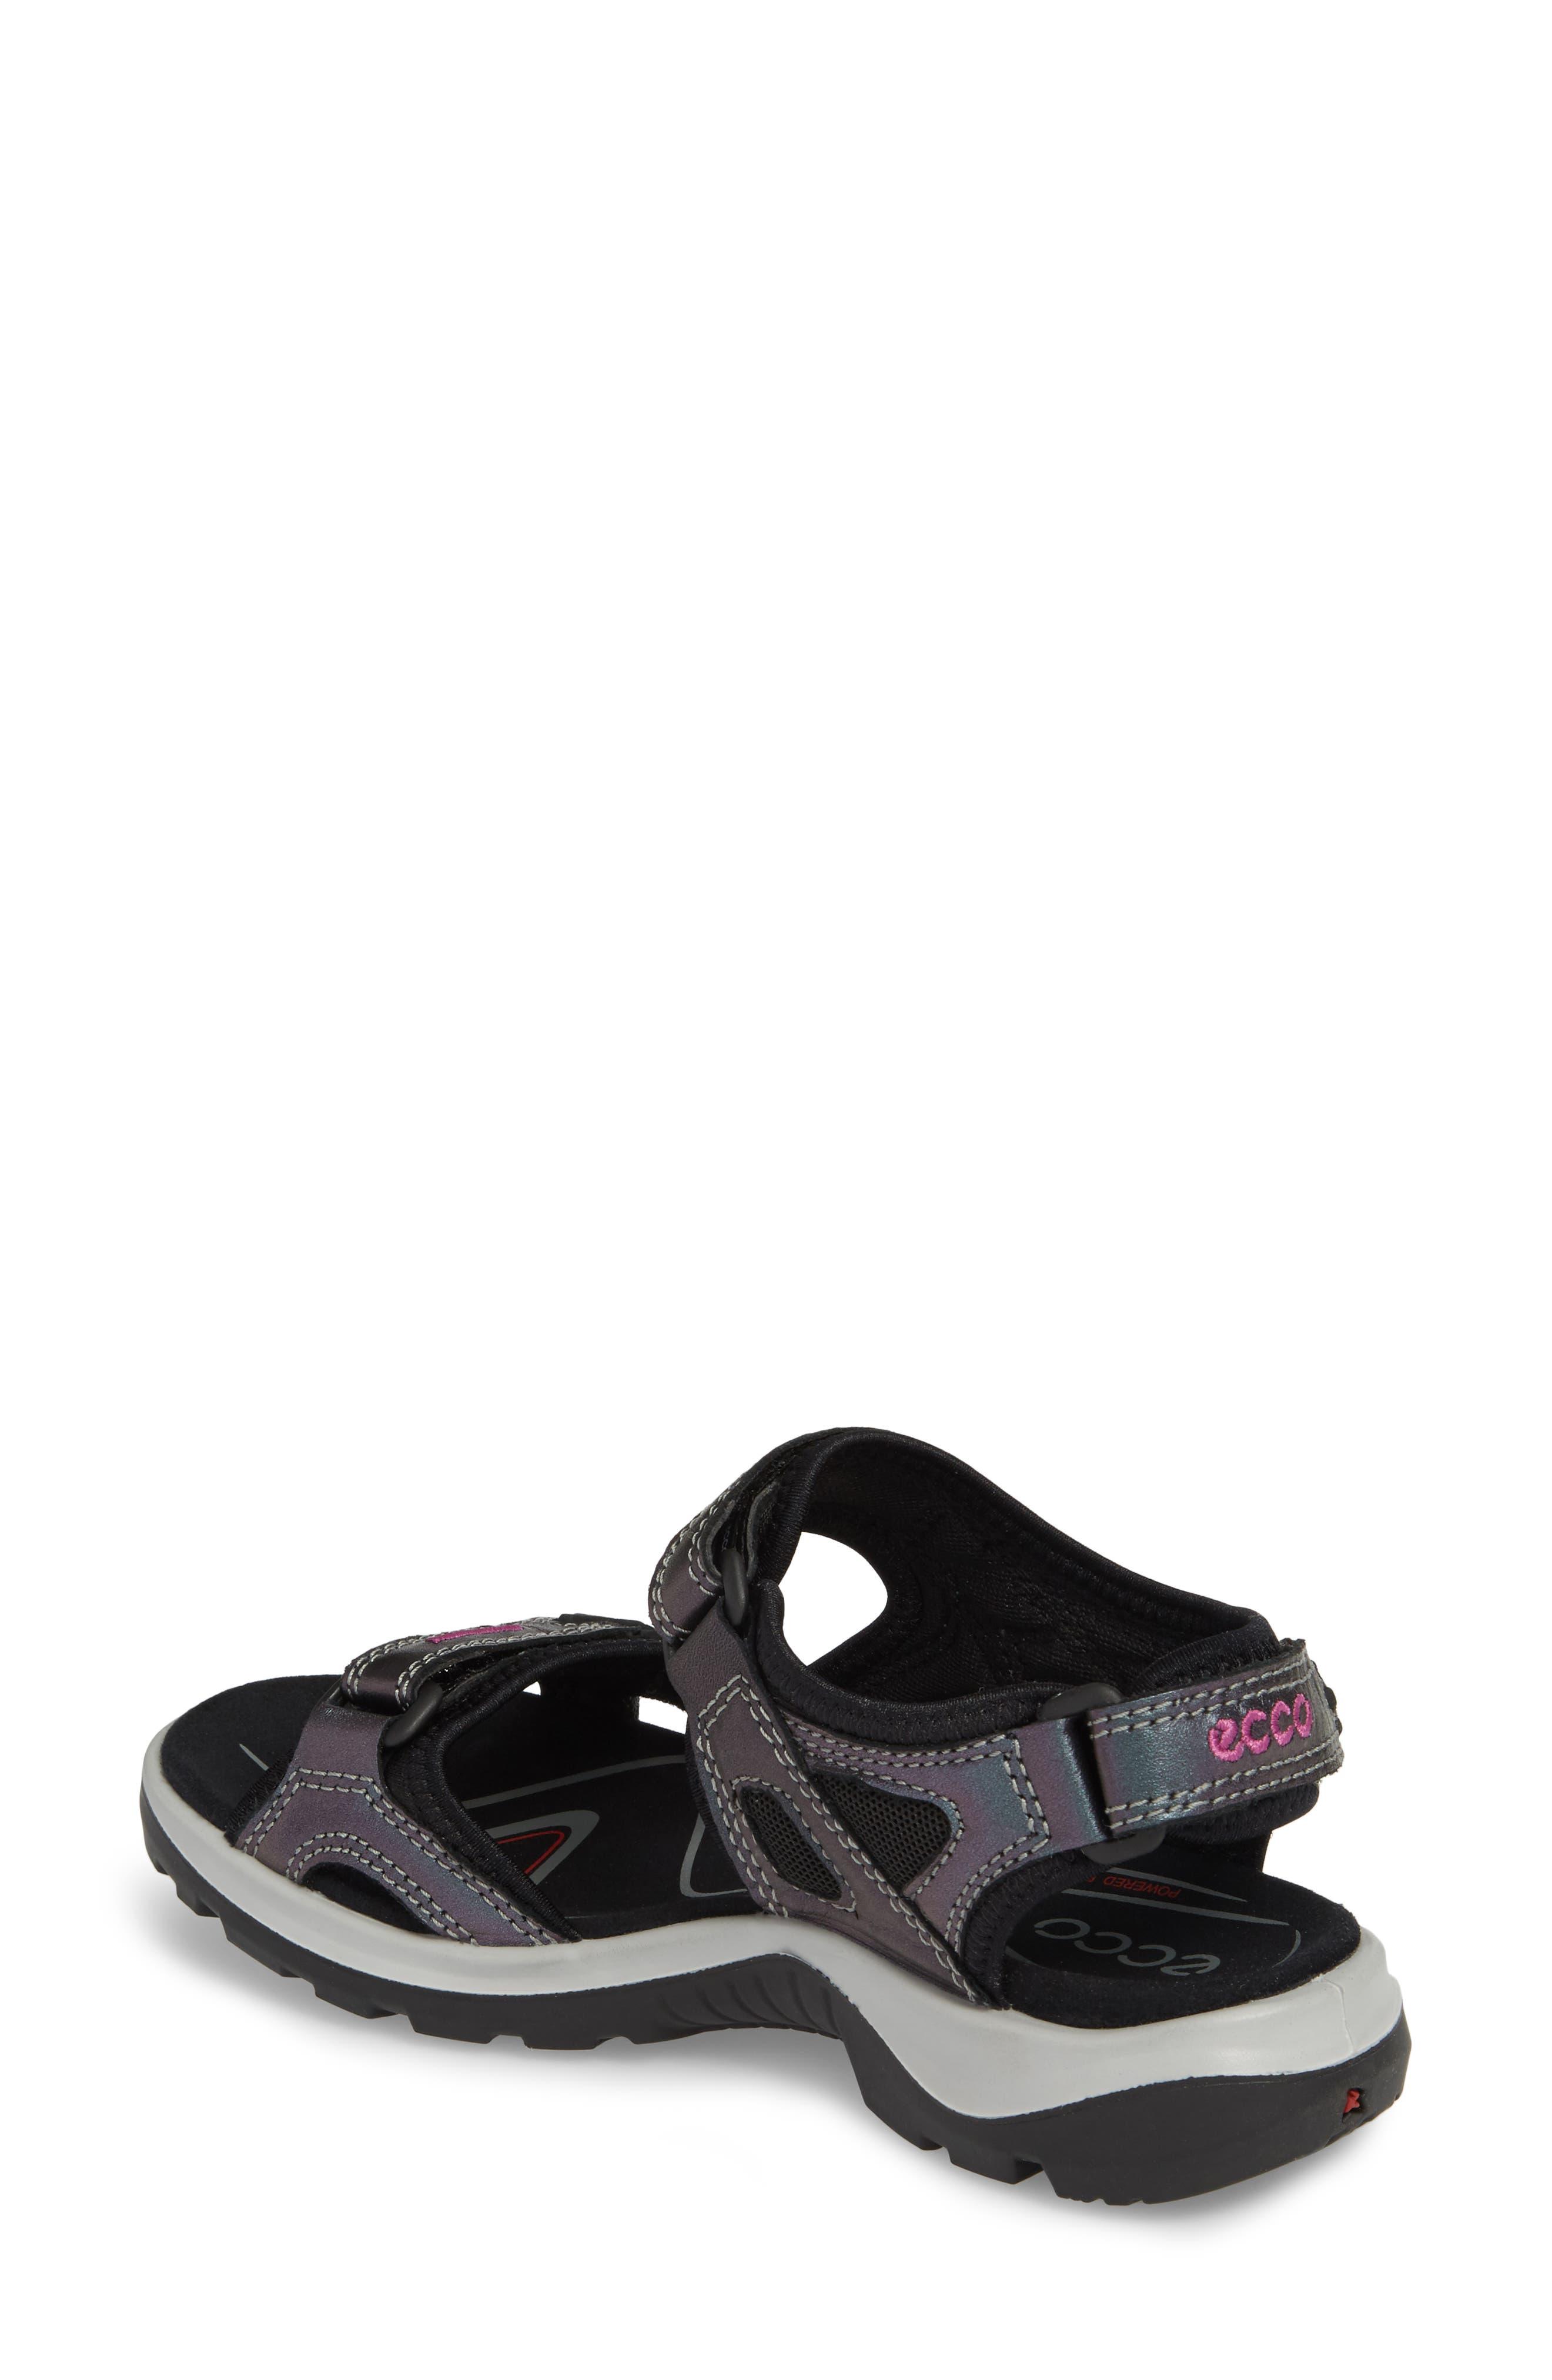 Women s ECCO Sandals  b804a4b8f35